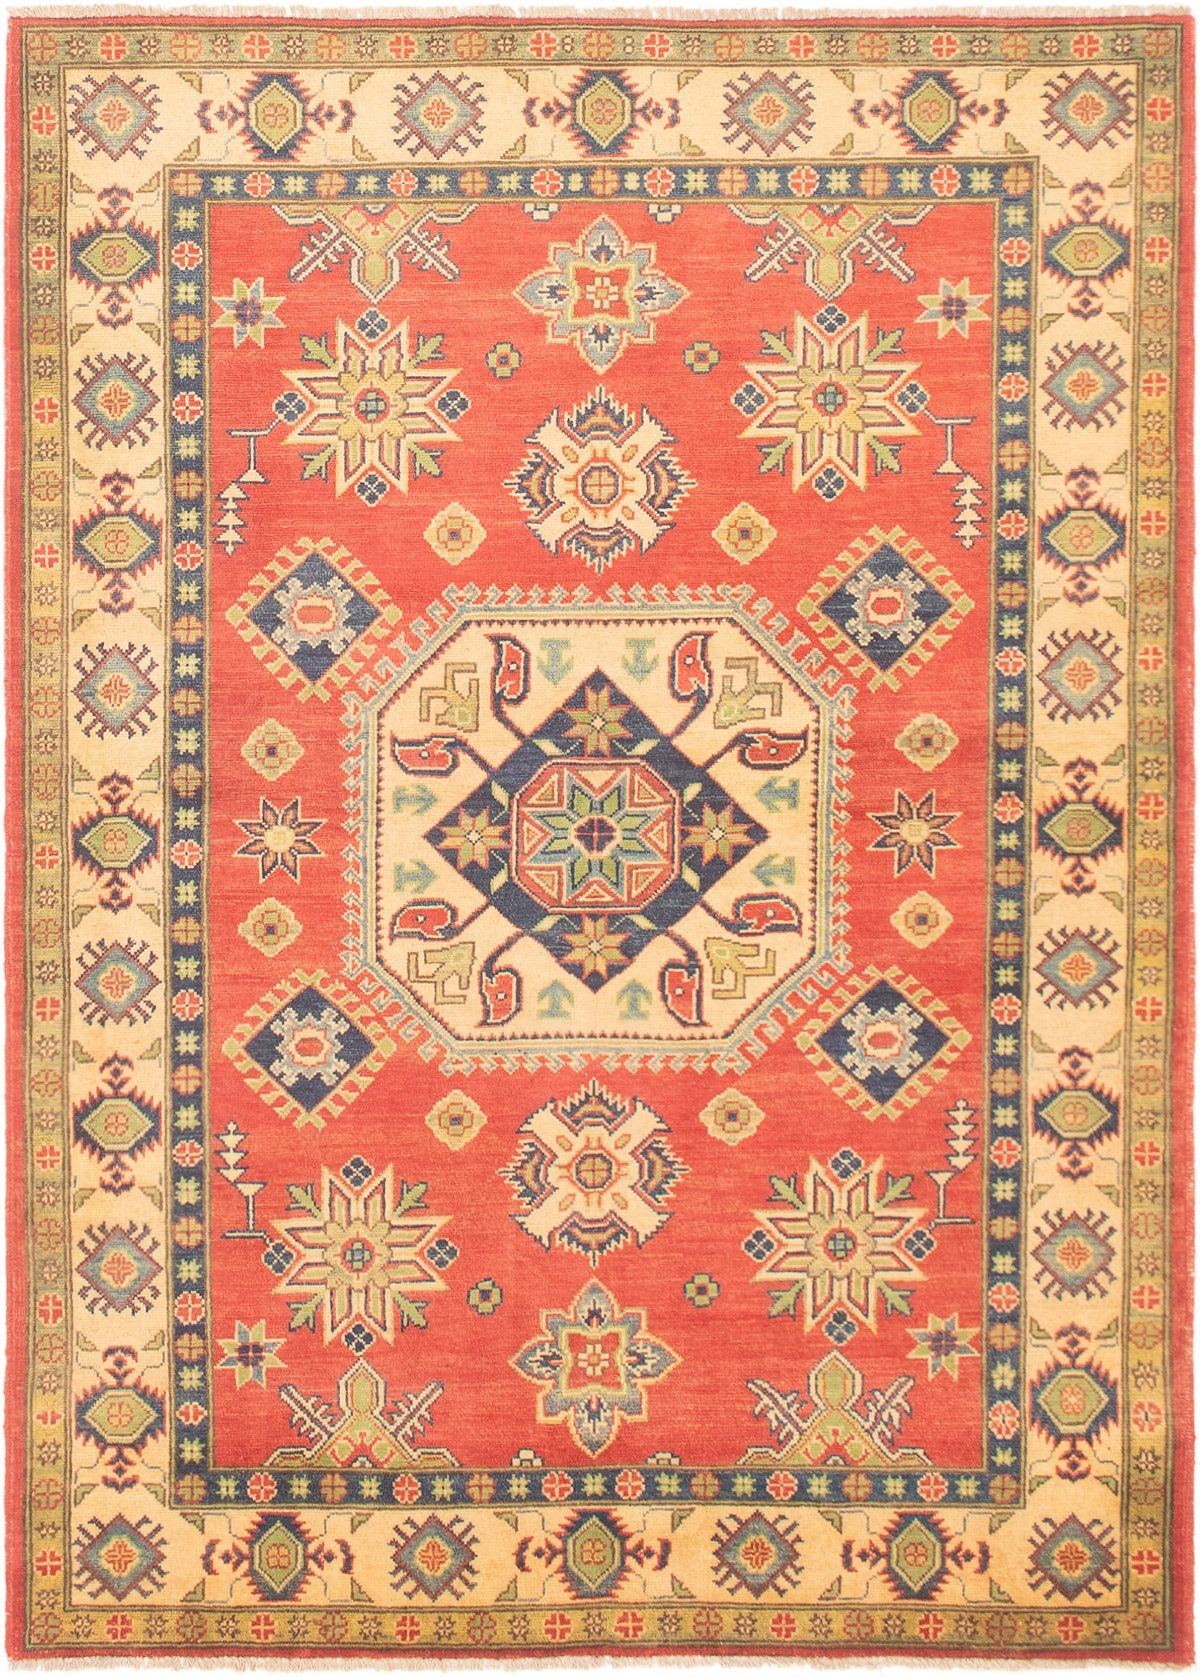 "Hand-knotted Finest Gazni Dark Copper Wool Rug 4'11"" x 6'9""  Size: 4'11"" x 6'9"""